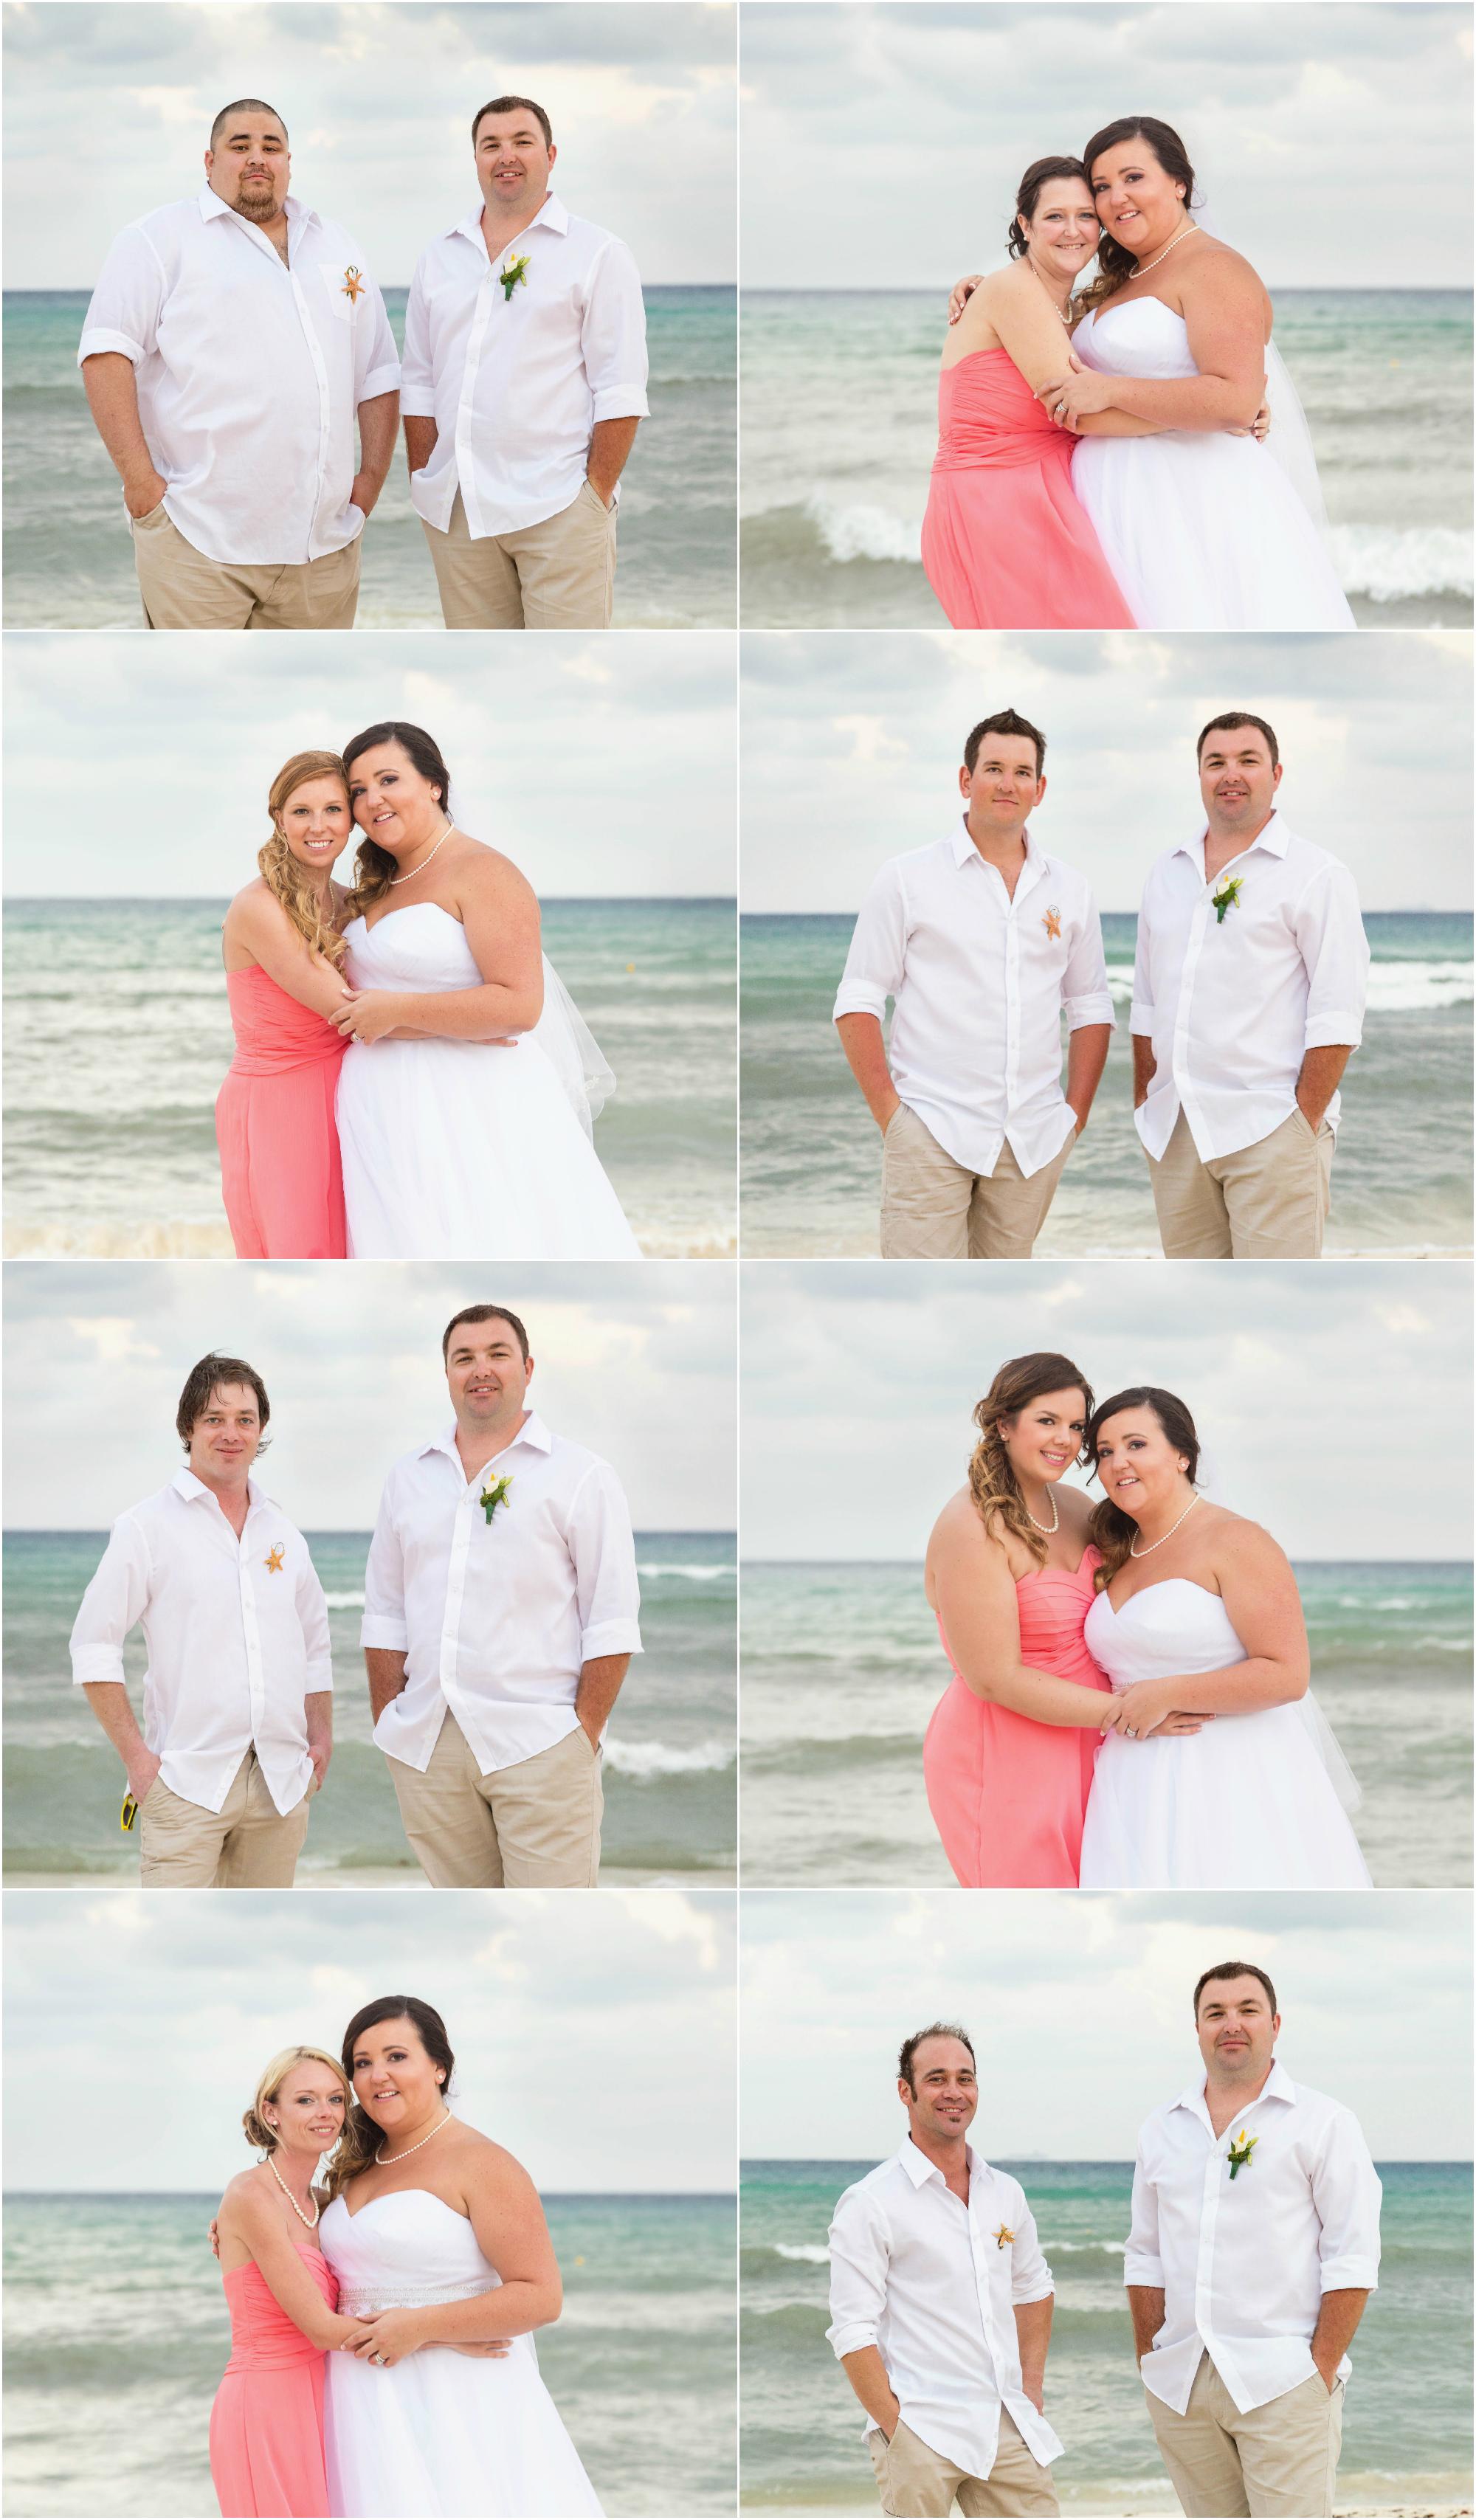 cancun_wedding32.png